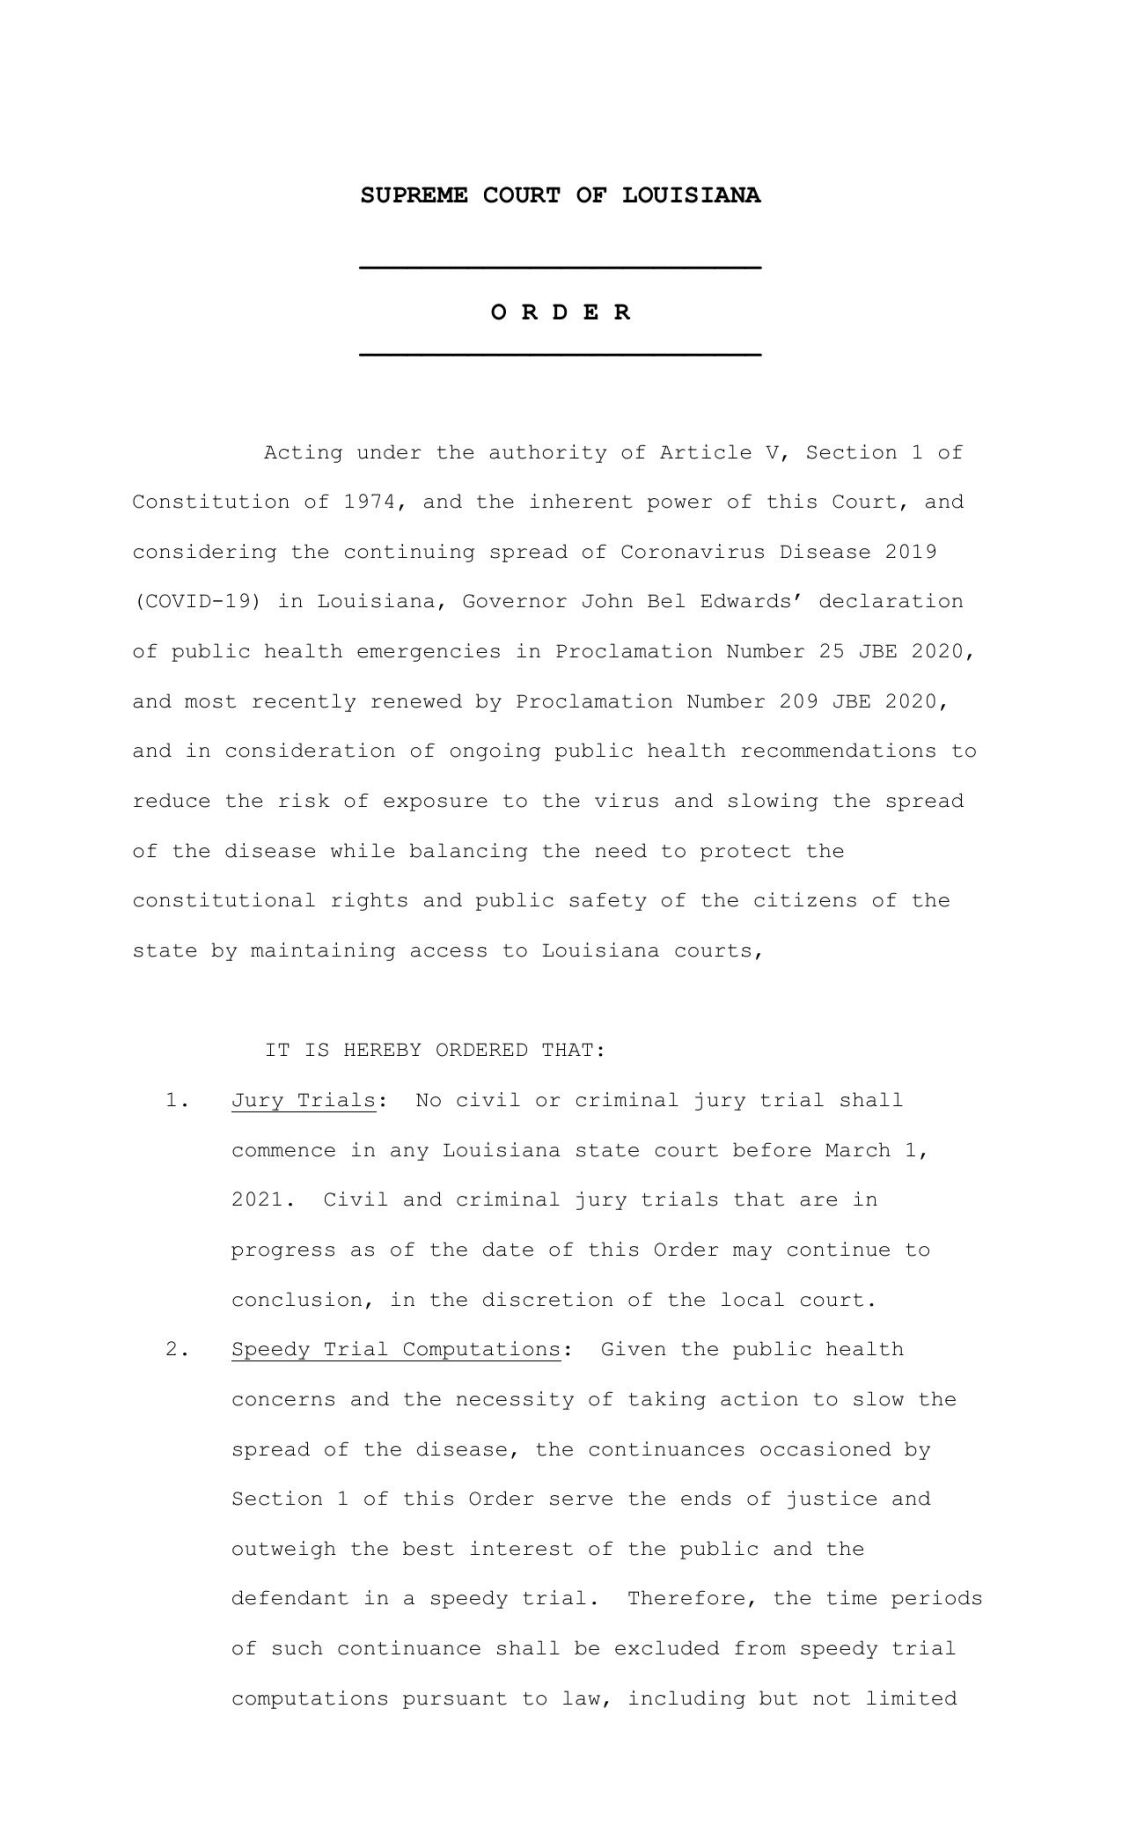 2021-01-11_LASC_ORDER.pdf